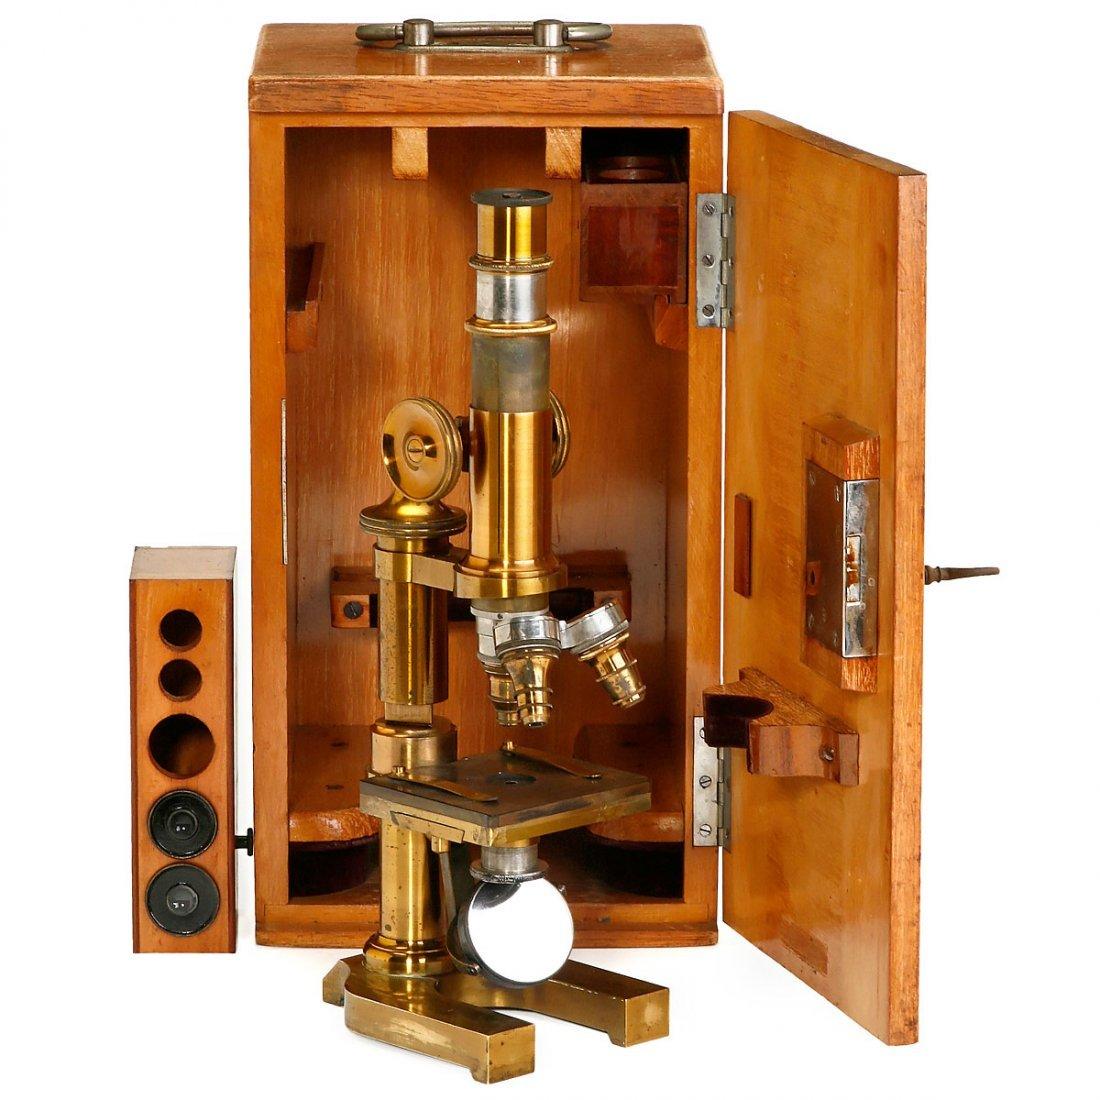 Leitz Brass Microscope, 1898